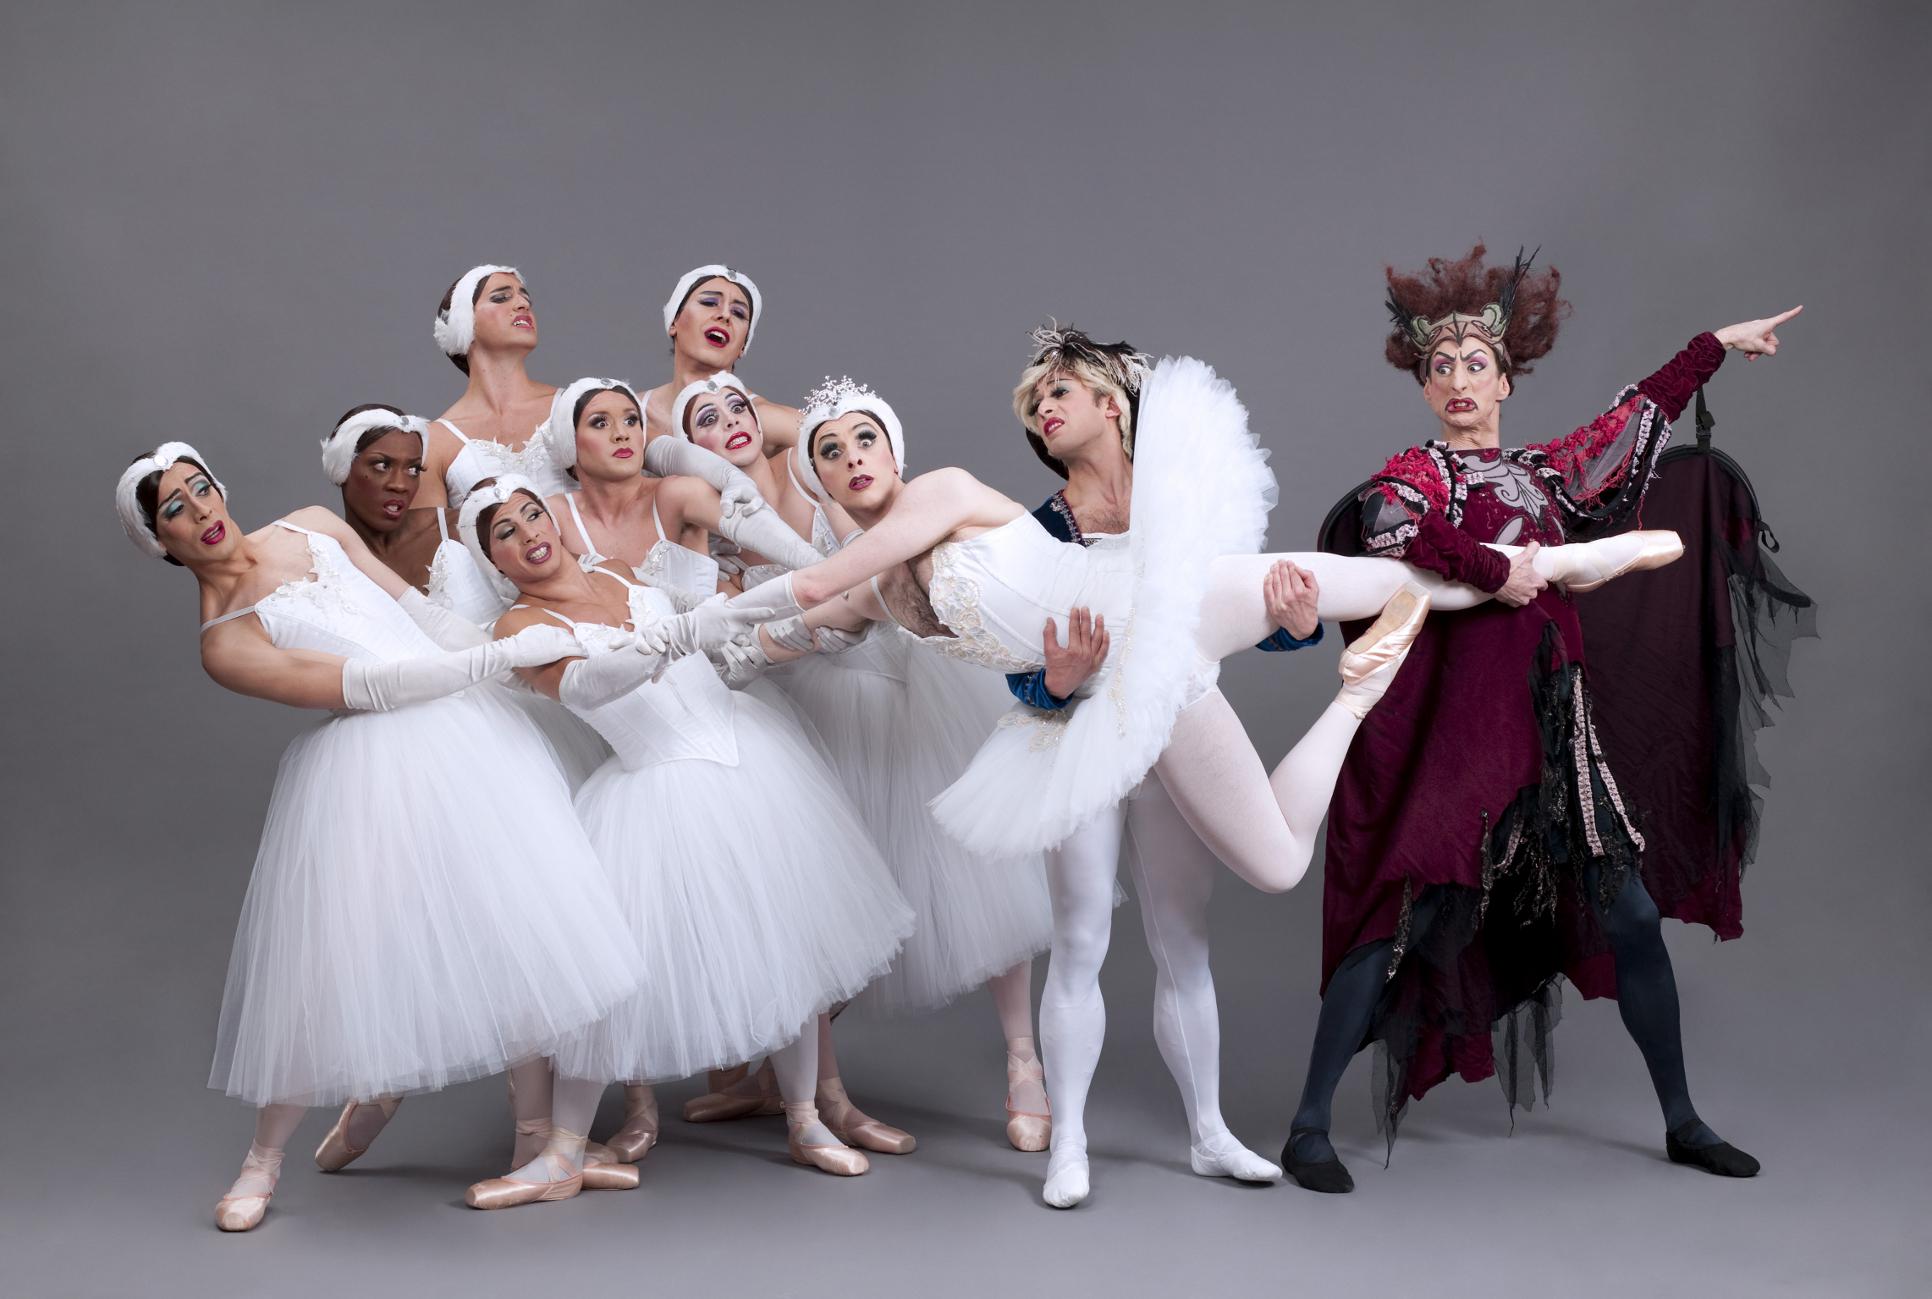 http://kulturkompasset.com/wp-content/uploads/2014/01/Ballets-Trockadero_Swan-Lake-I.jpg